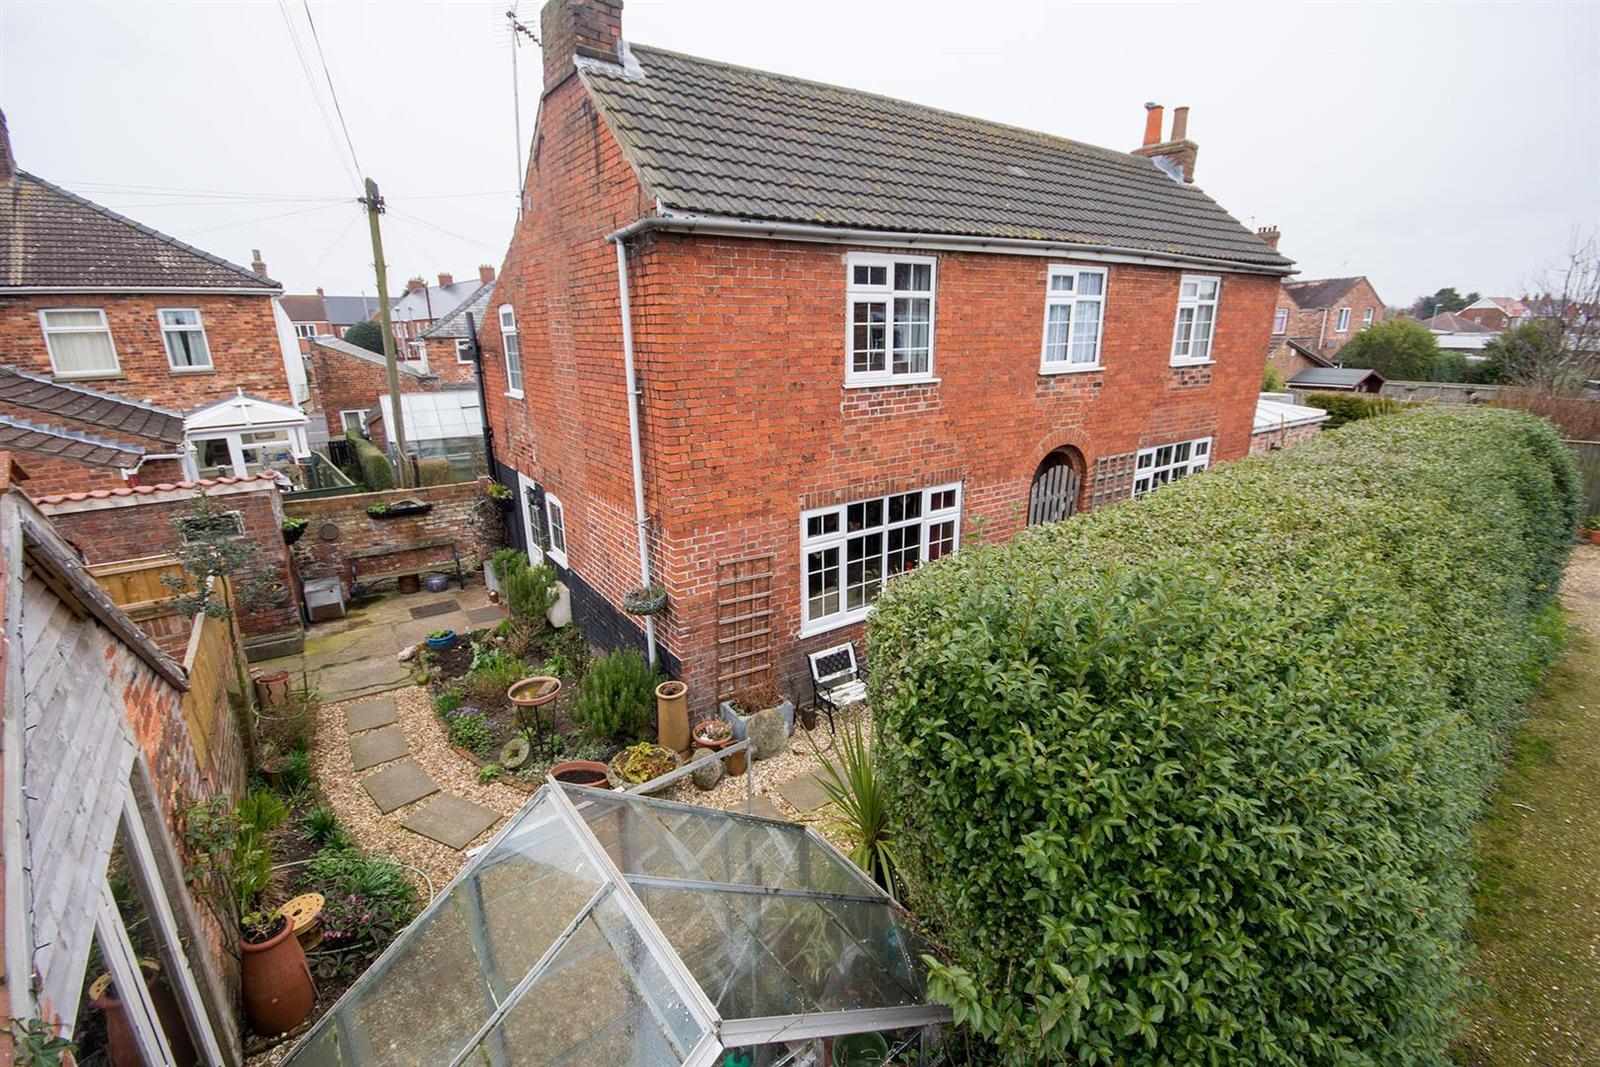 4 Bedrooms Property for sale in Reynard Street, Spilsby